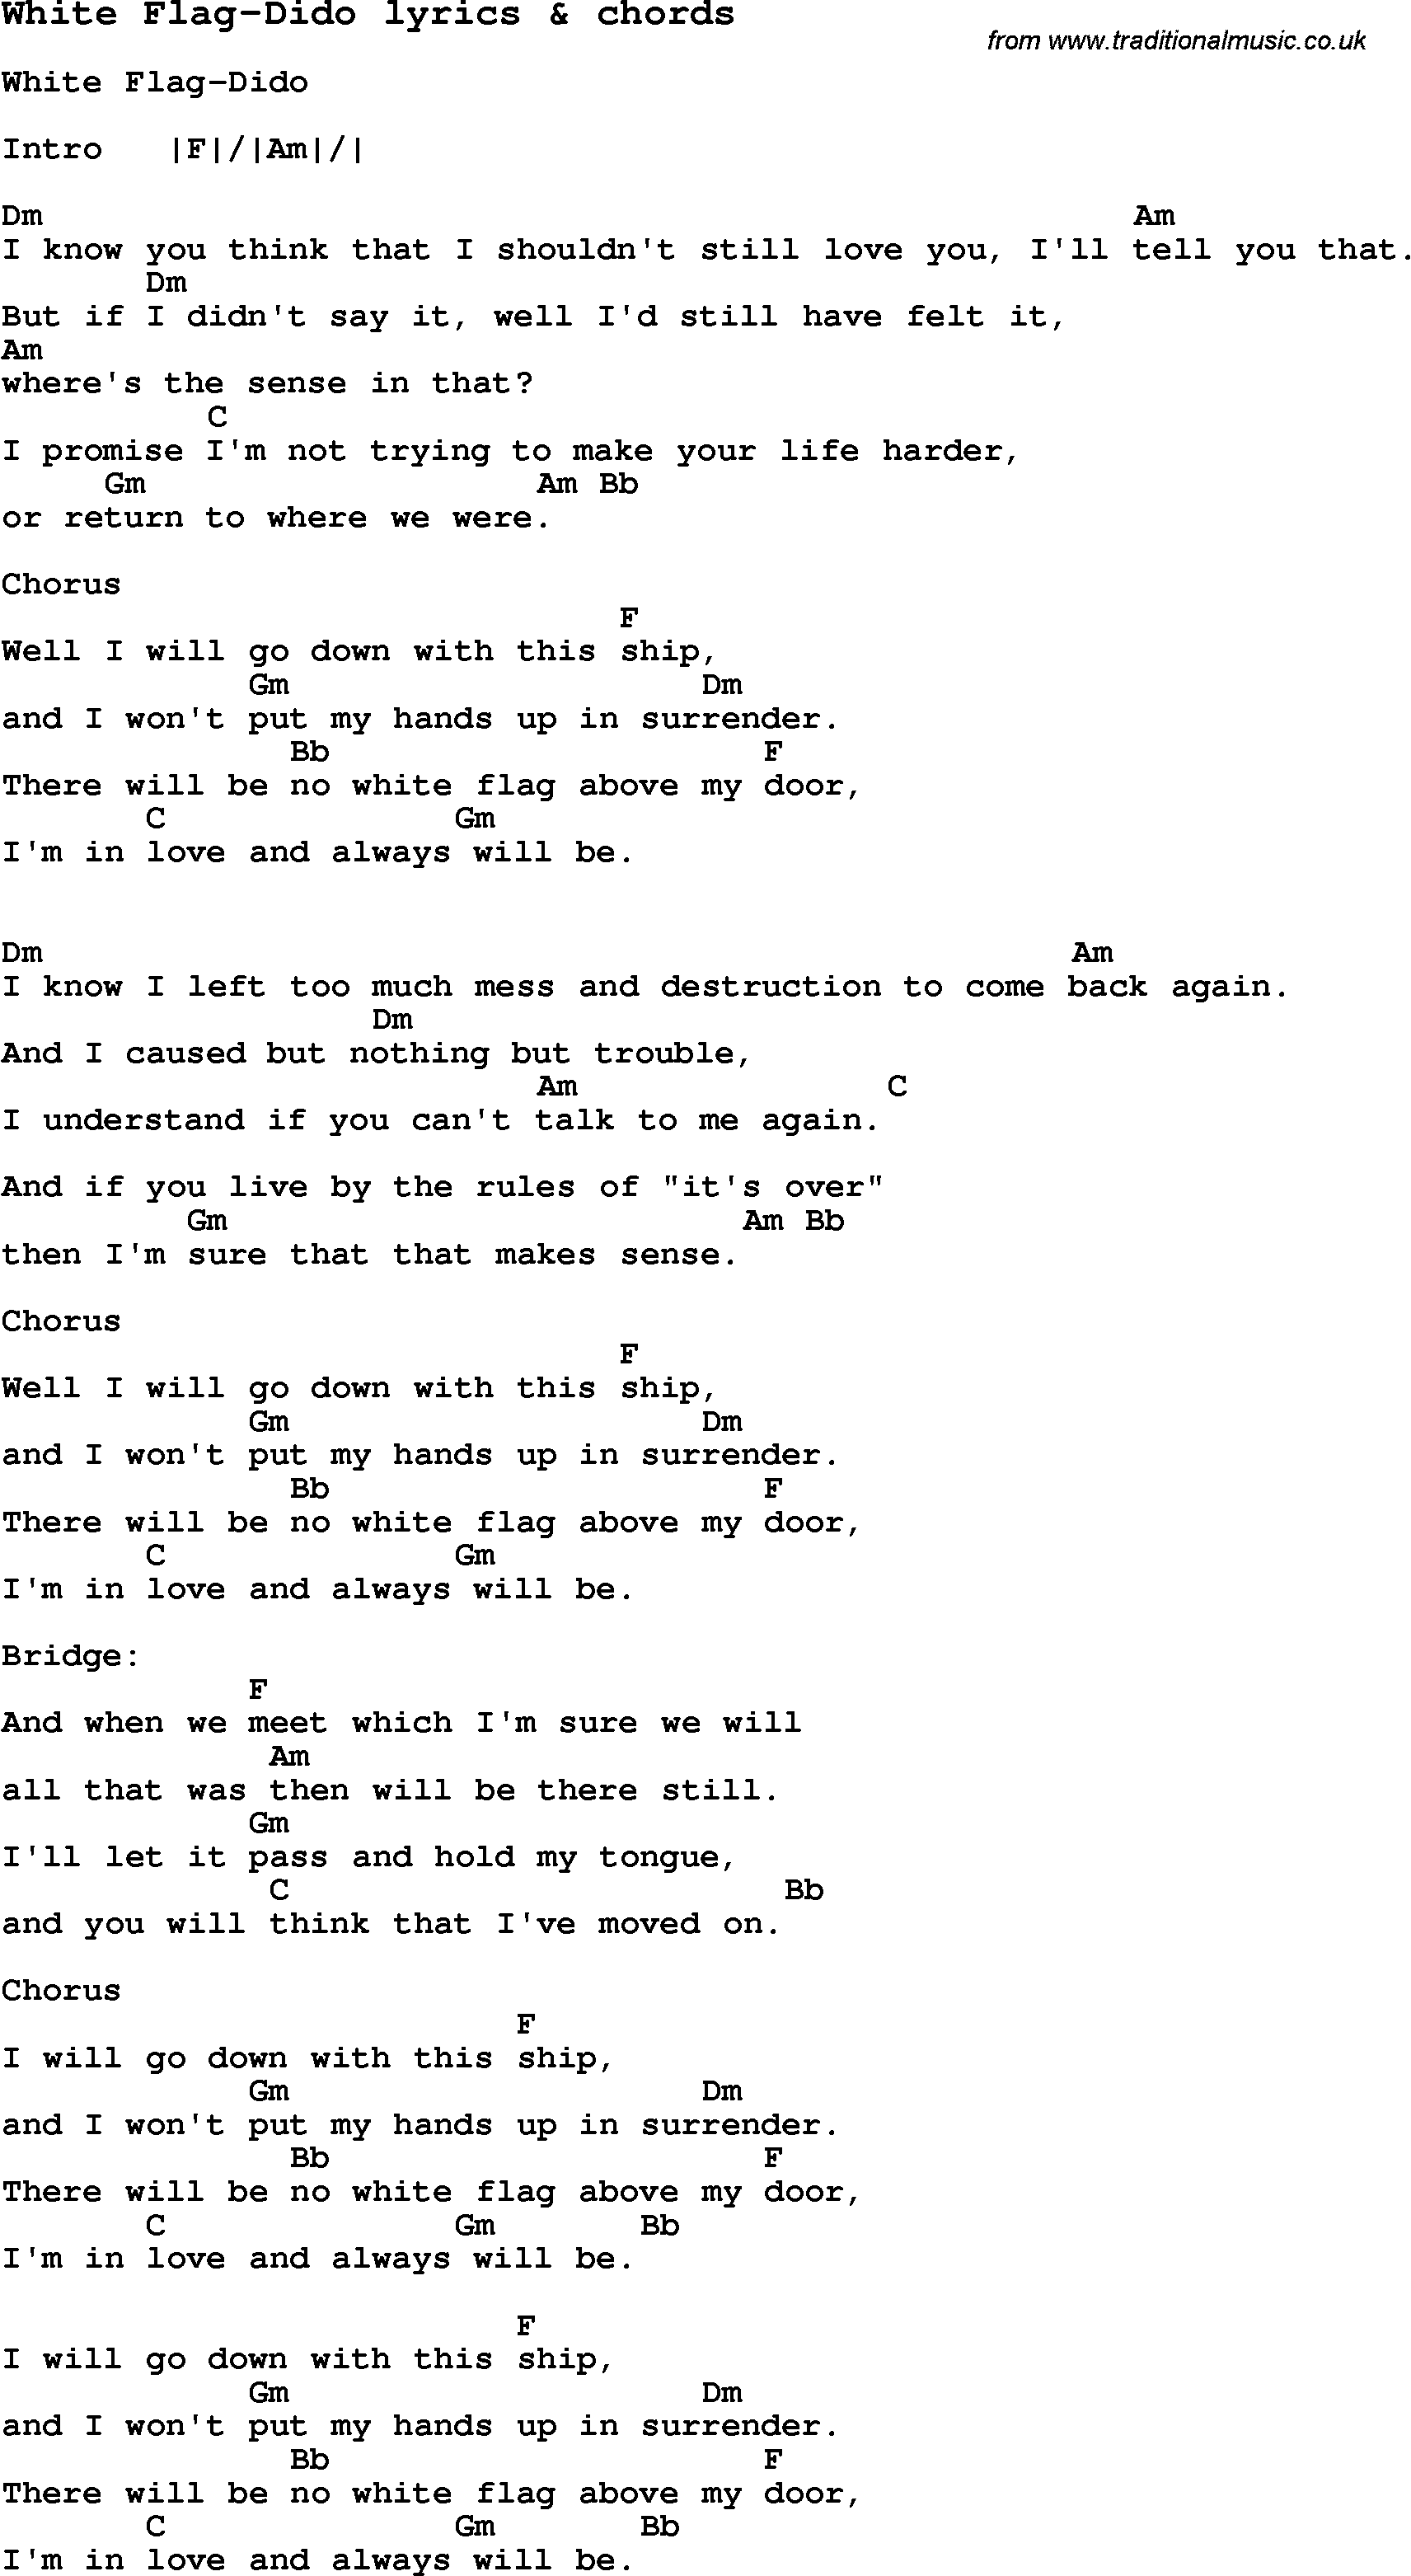 Love Song Lyrics For White Flag Dido With Chords For Ukulele Guitar Banjo Etc Dido Lyrics Dido Lyrics And Chords